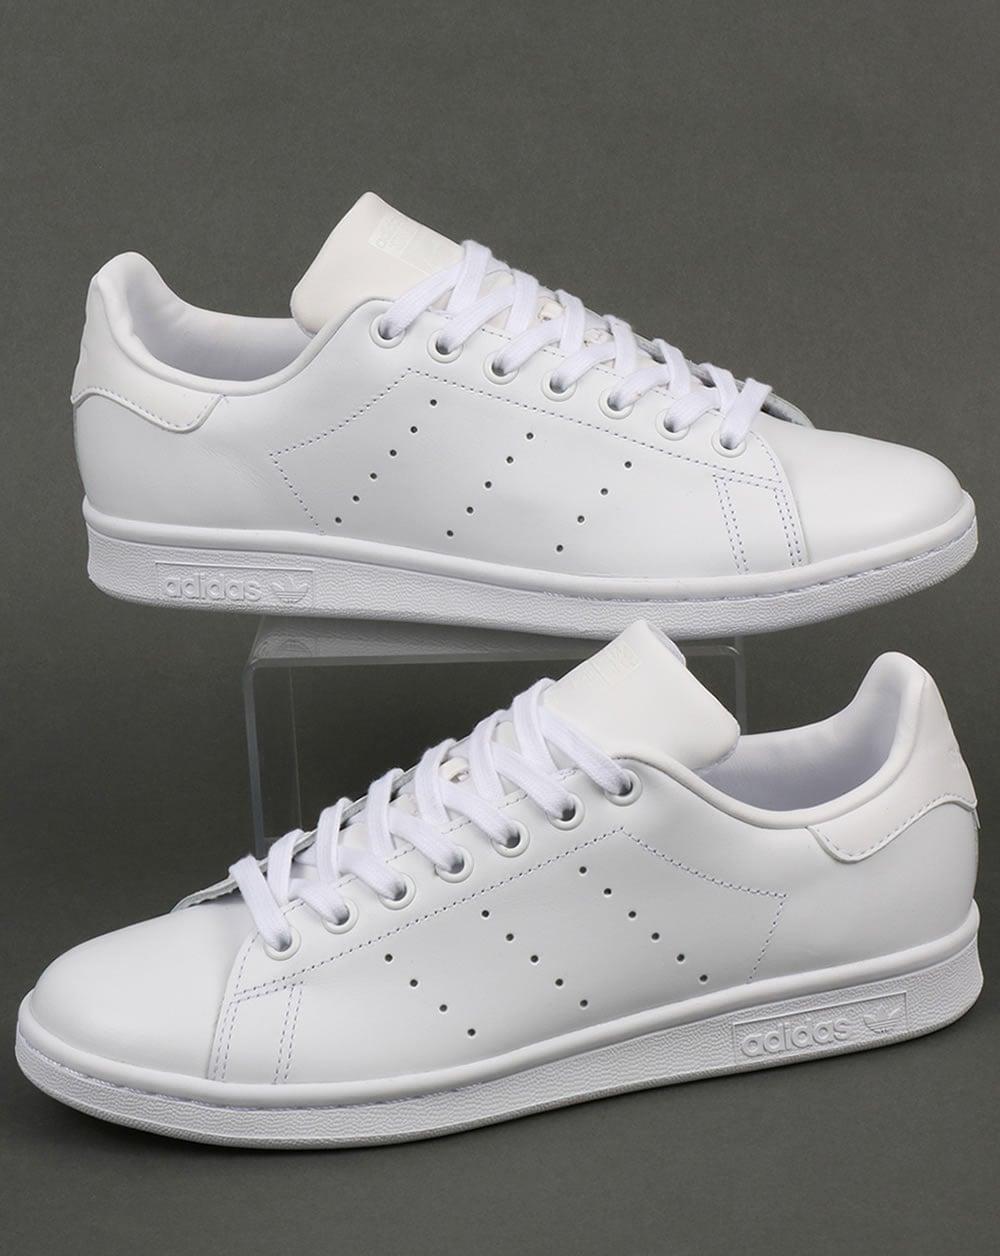 adidas-stan-smith-trainers-triple-white-p8883-58407_image